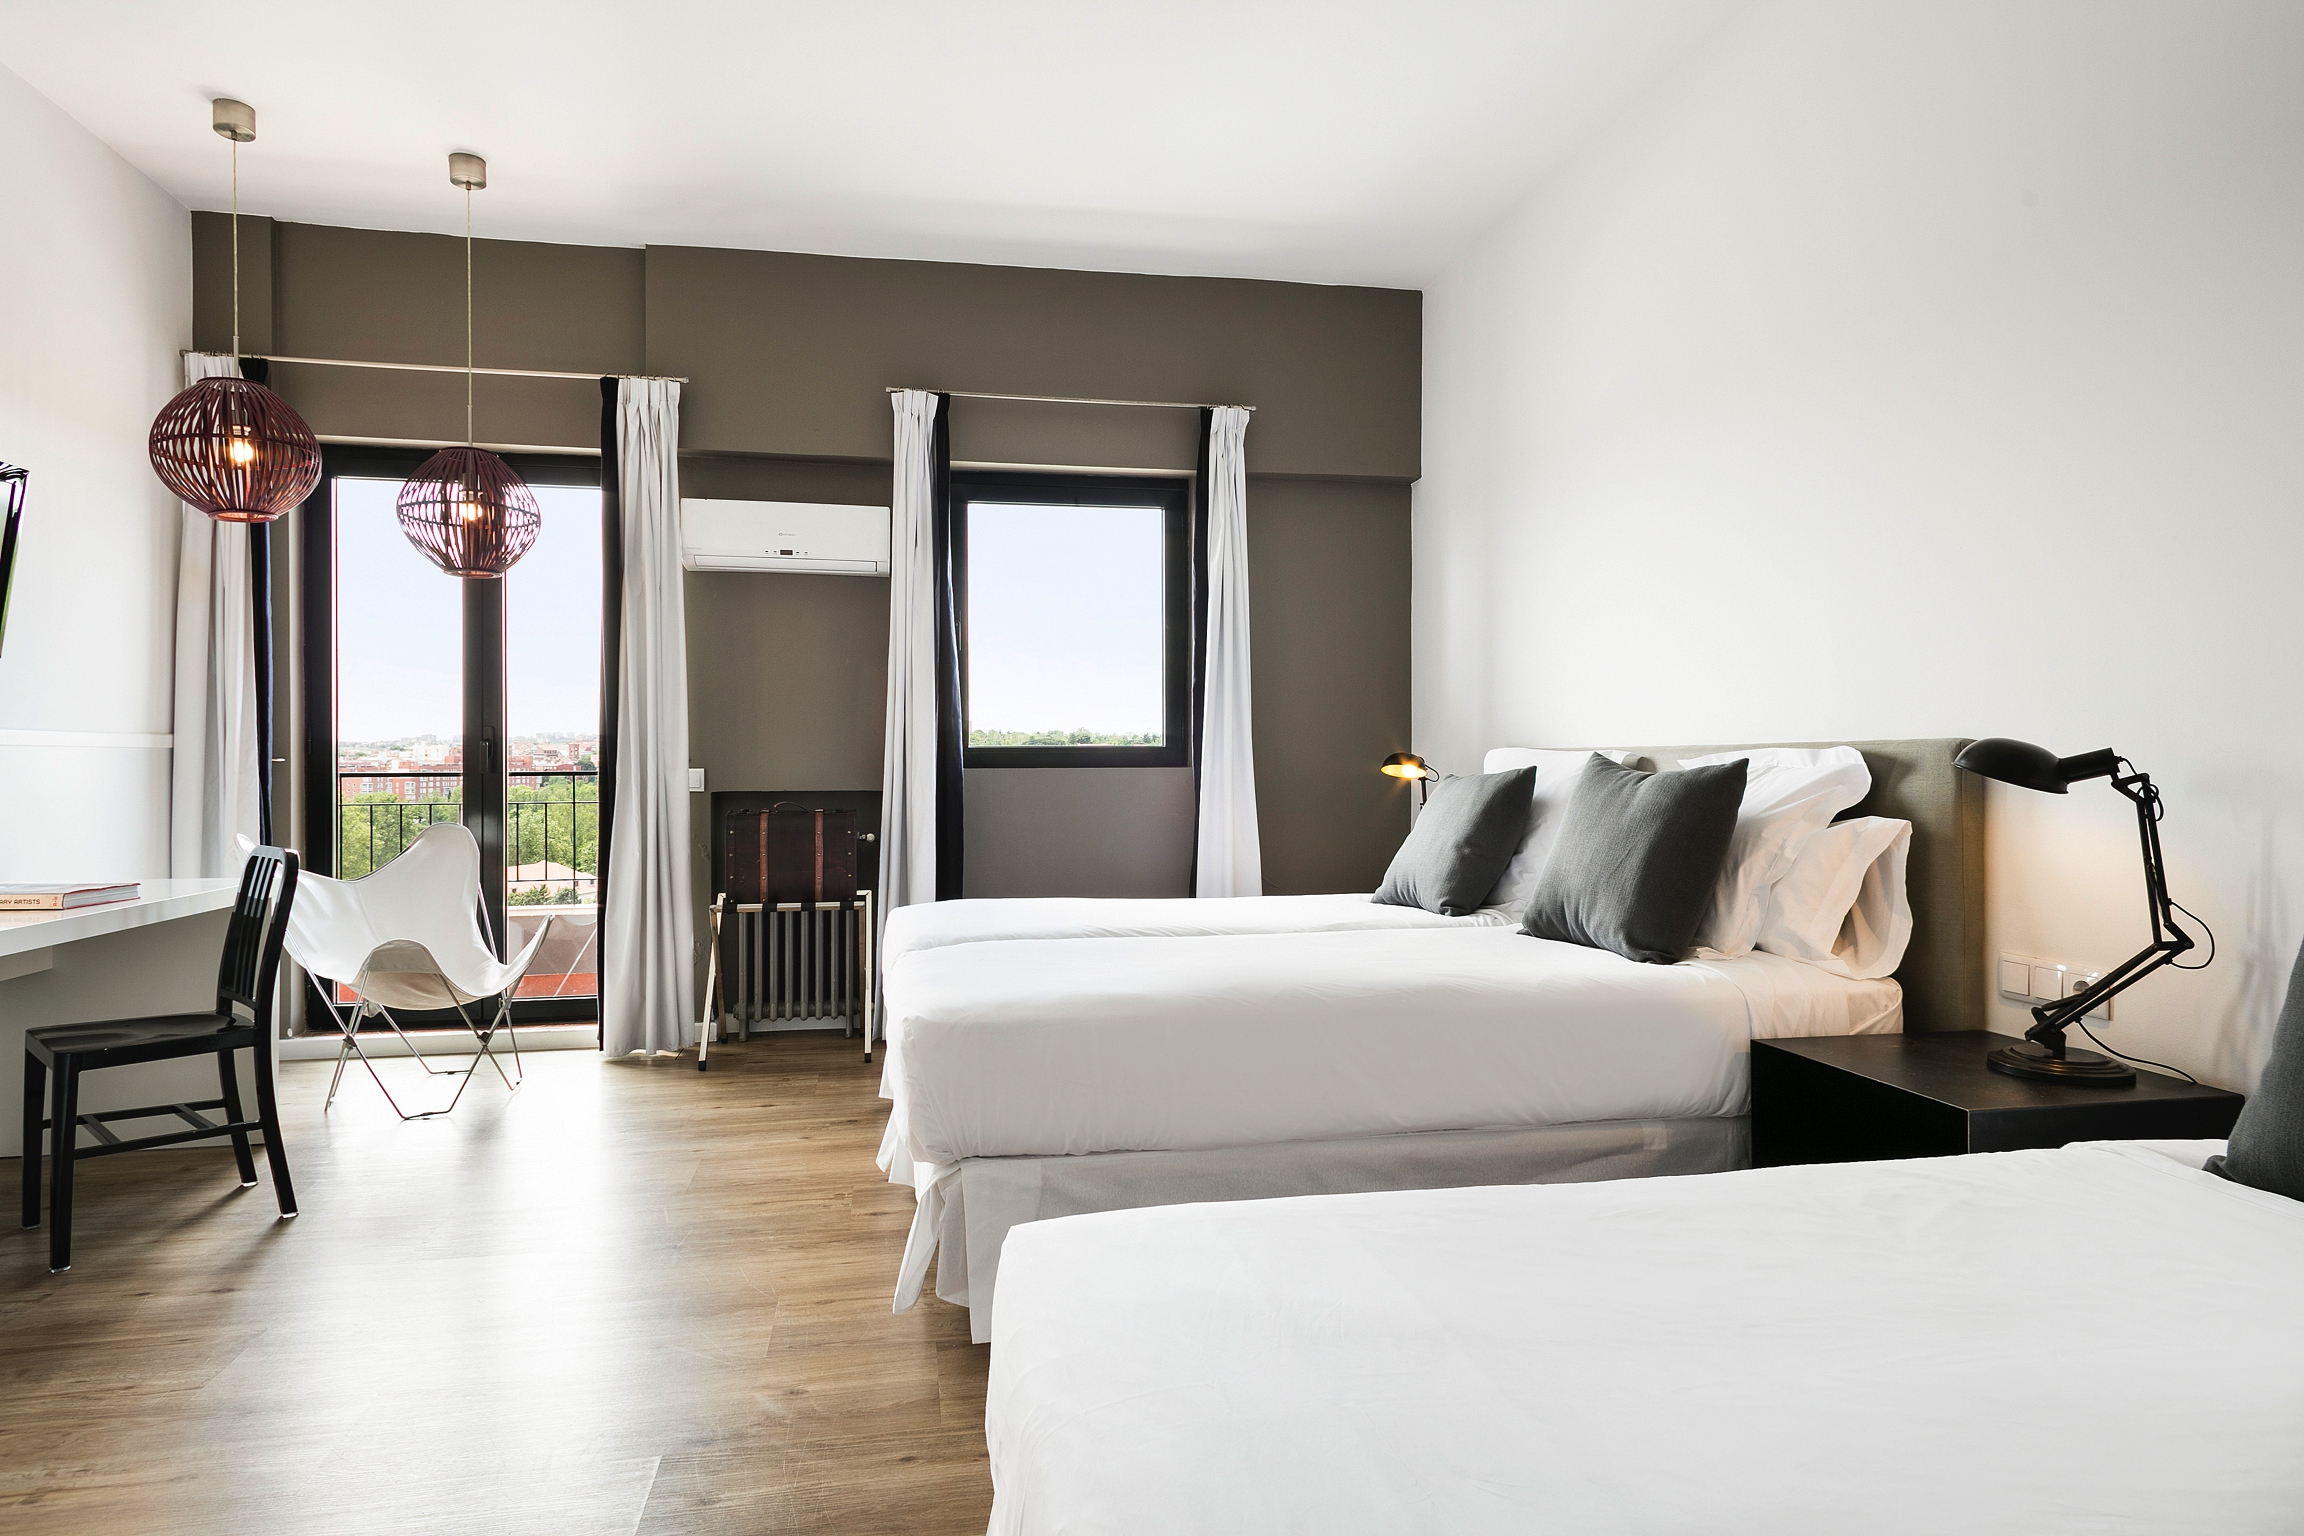 HOTEL_MADFOR_DOBLE_TRIPLE_STANDARD_01